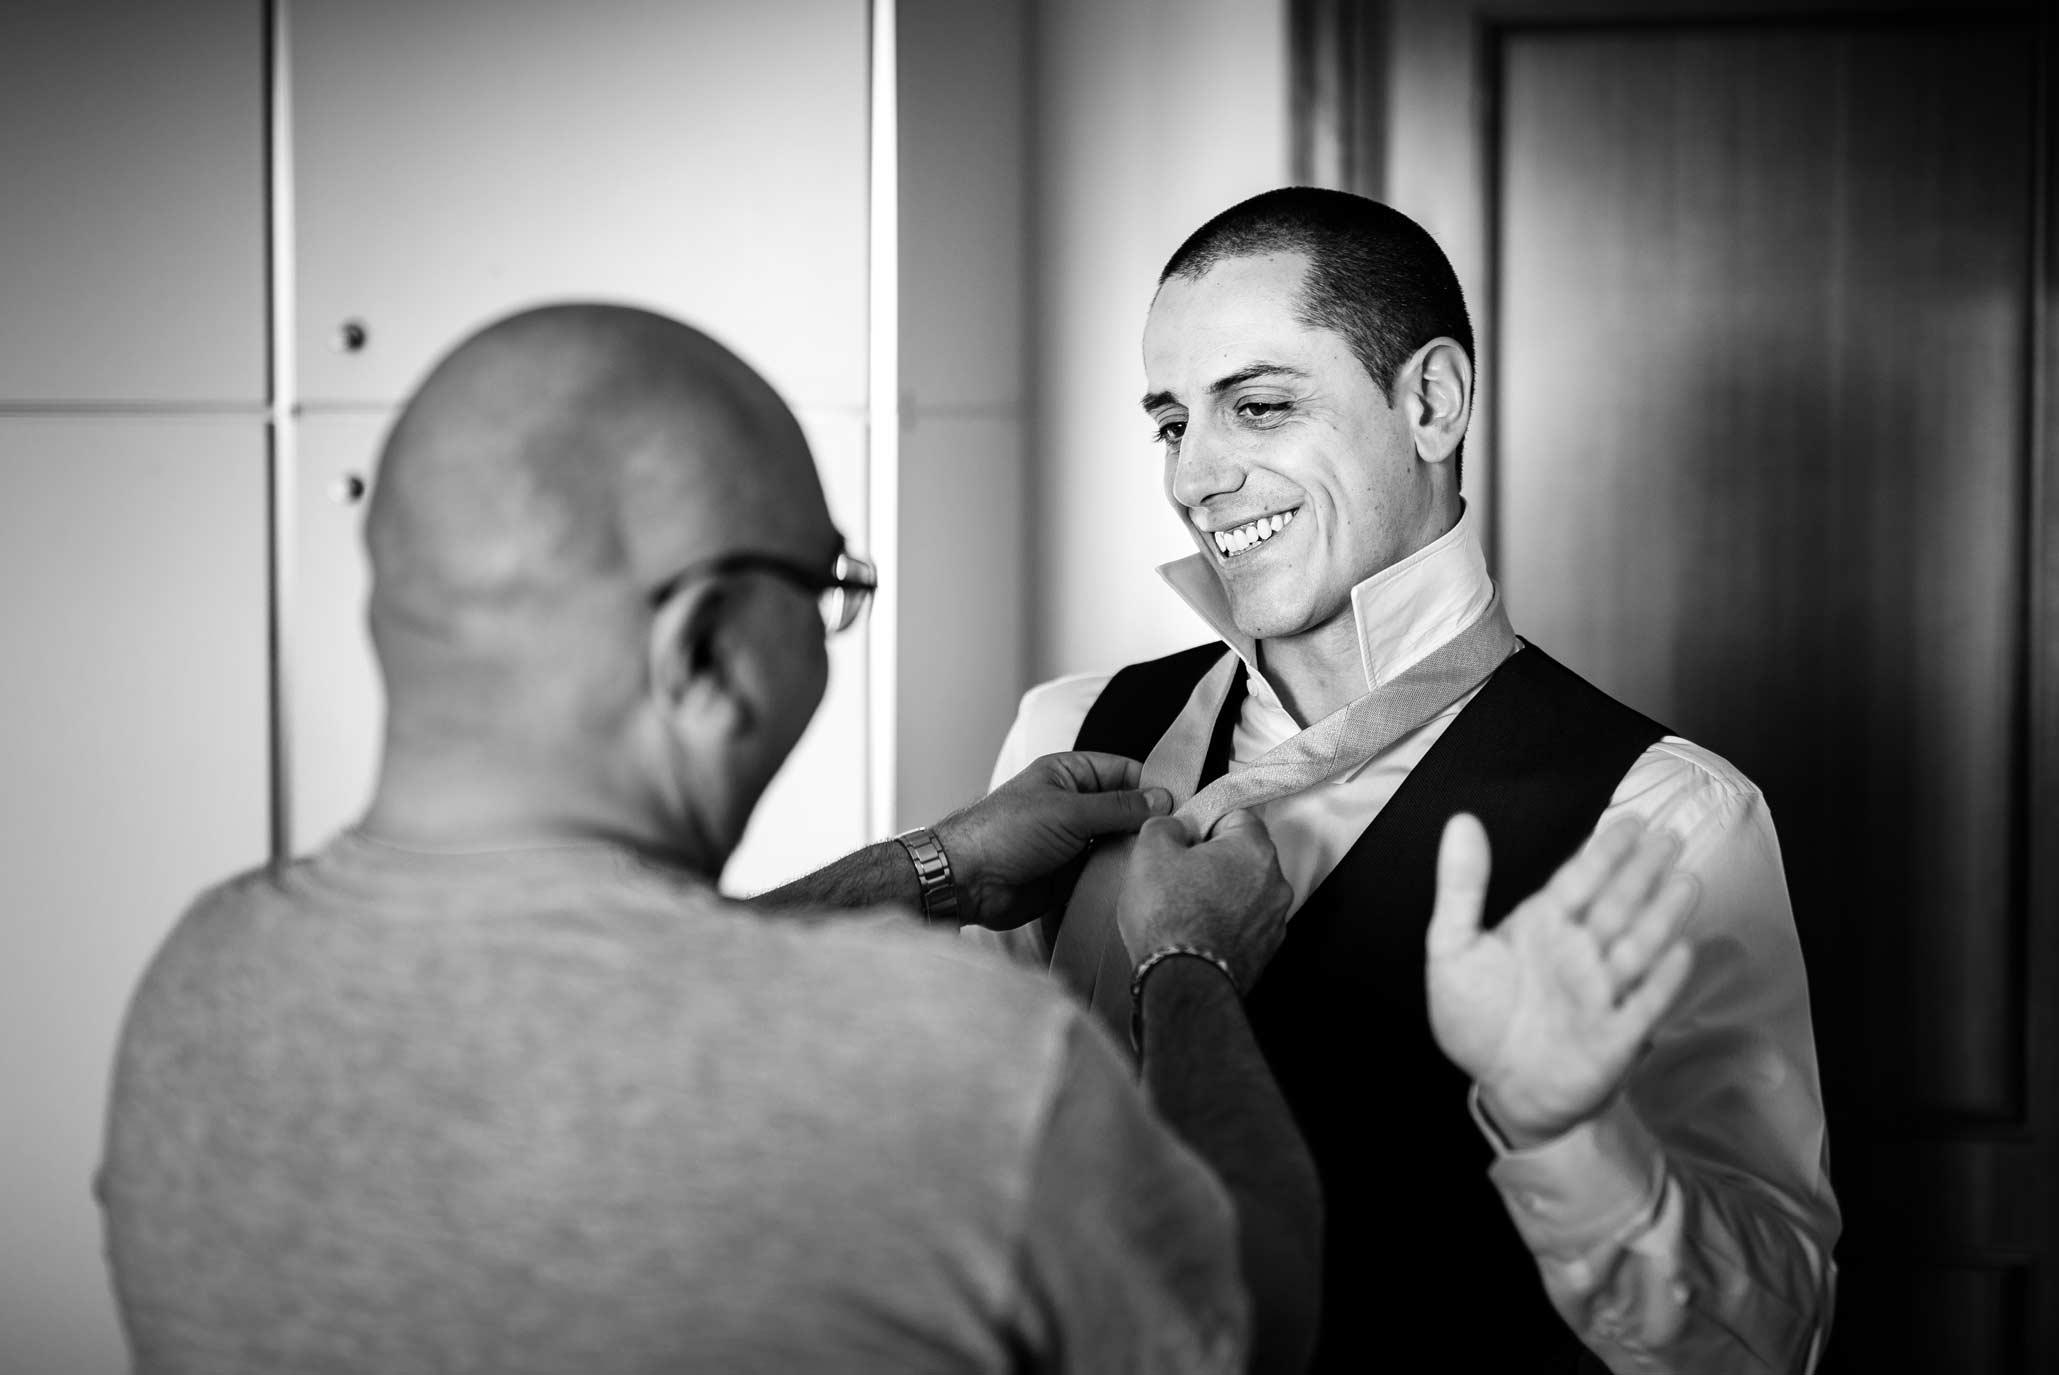 Reportage-Wedding-Photography-Destination-Wedding-Italy-Groom